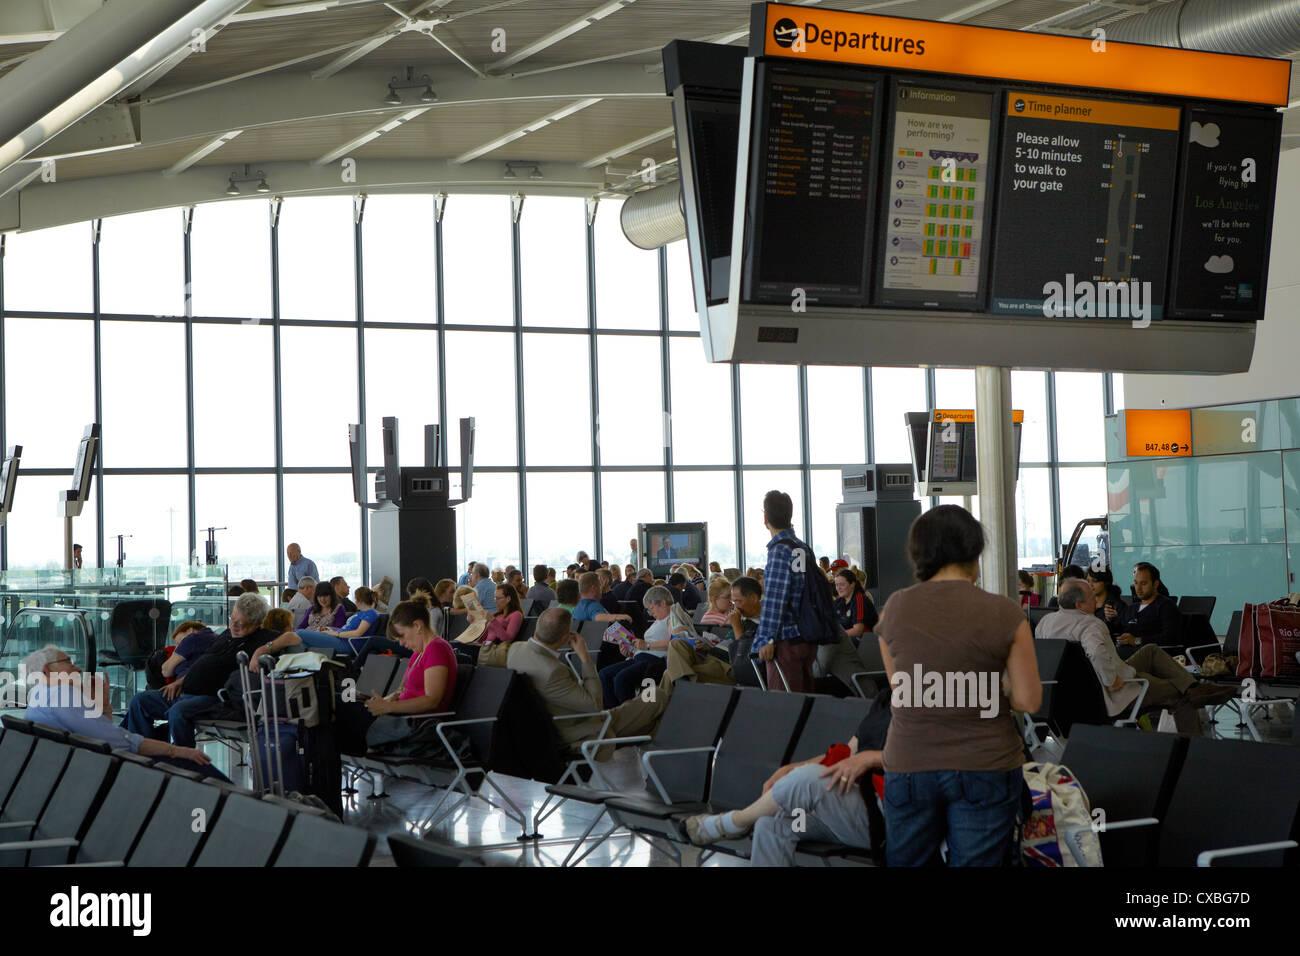 Terminal 5 departure hall, Heathrow Airport, UK - Stock Image